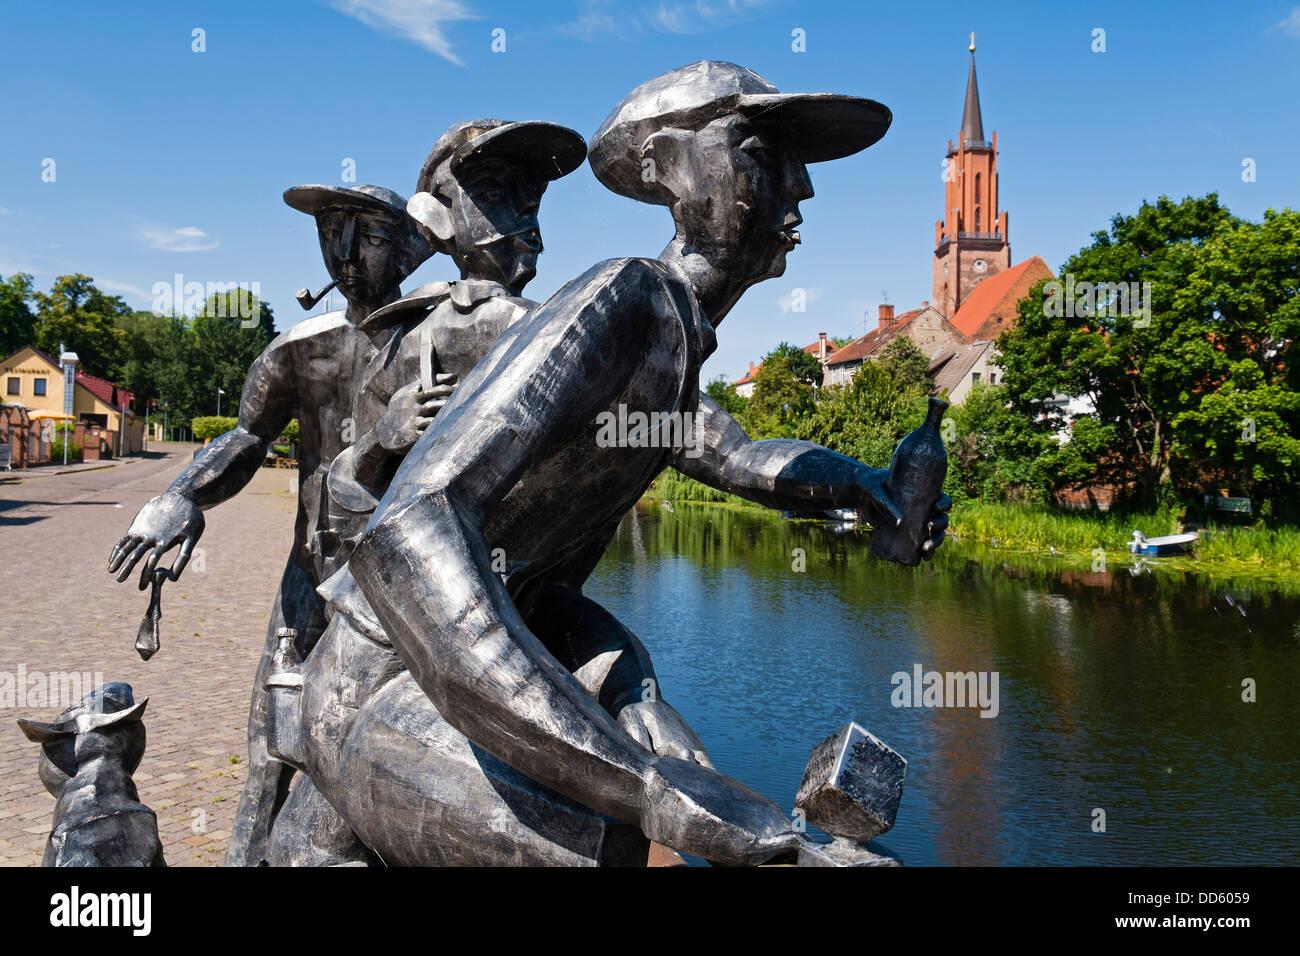 "Sculpture ""Schleusenspucker"", Rathenow, Germany Stock Photo"